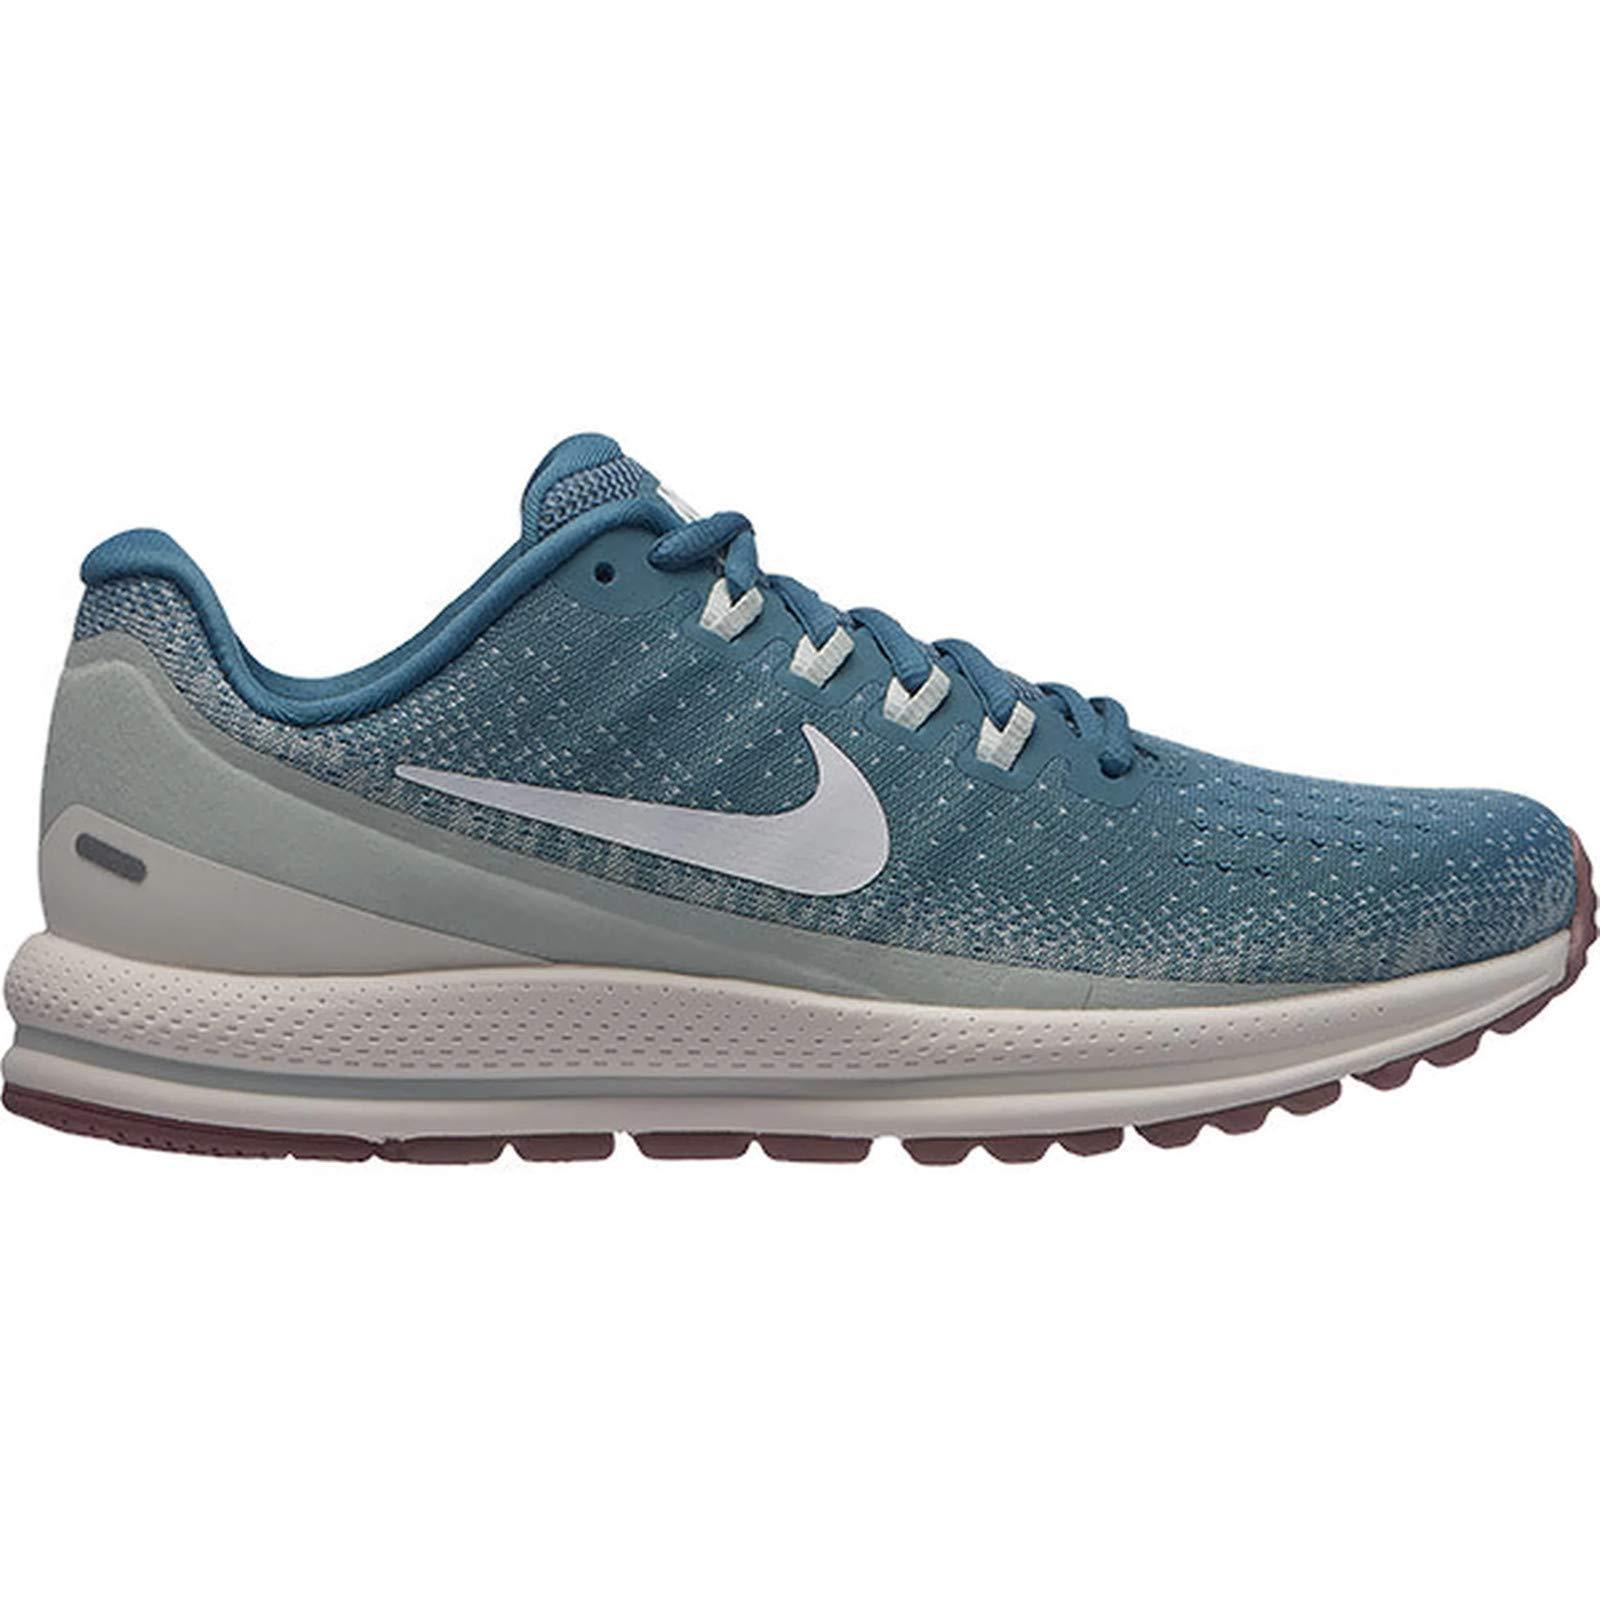 info for 5b27b 175b0 Galleon - Nike Women s Zoom Vomero 13 Running Shoes (9.5 B US, Celestial  Teal White Light Silver)